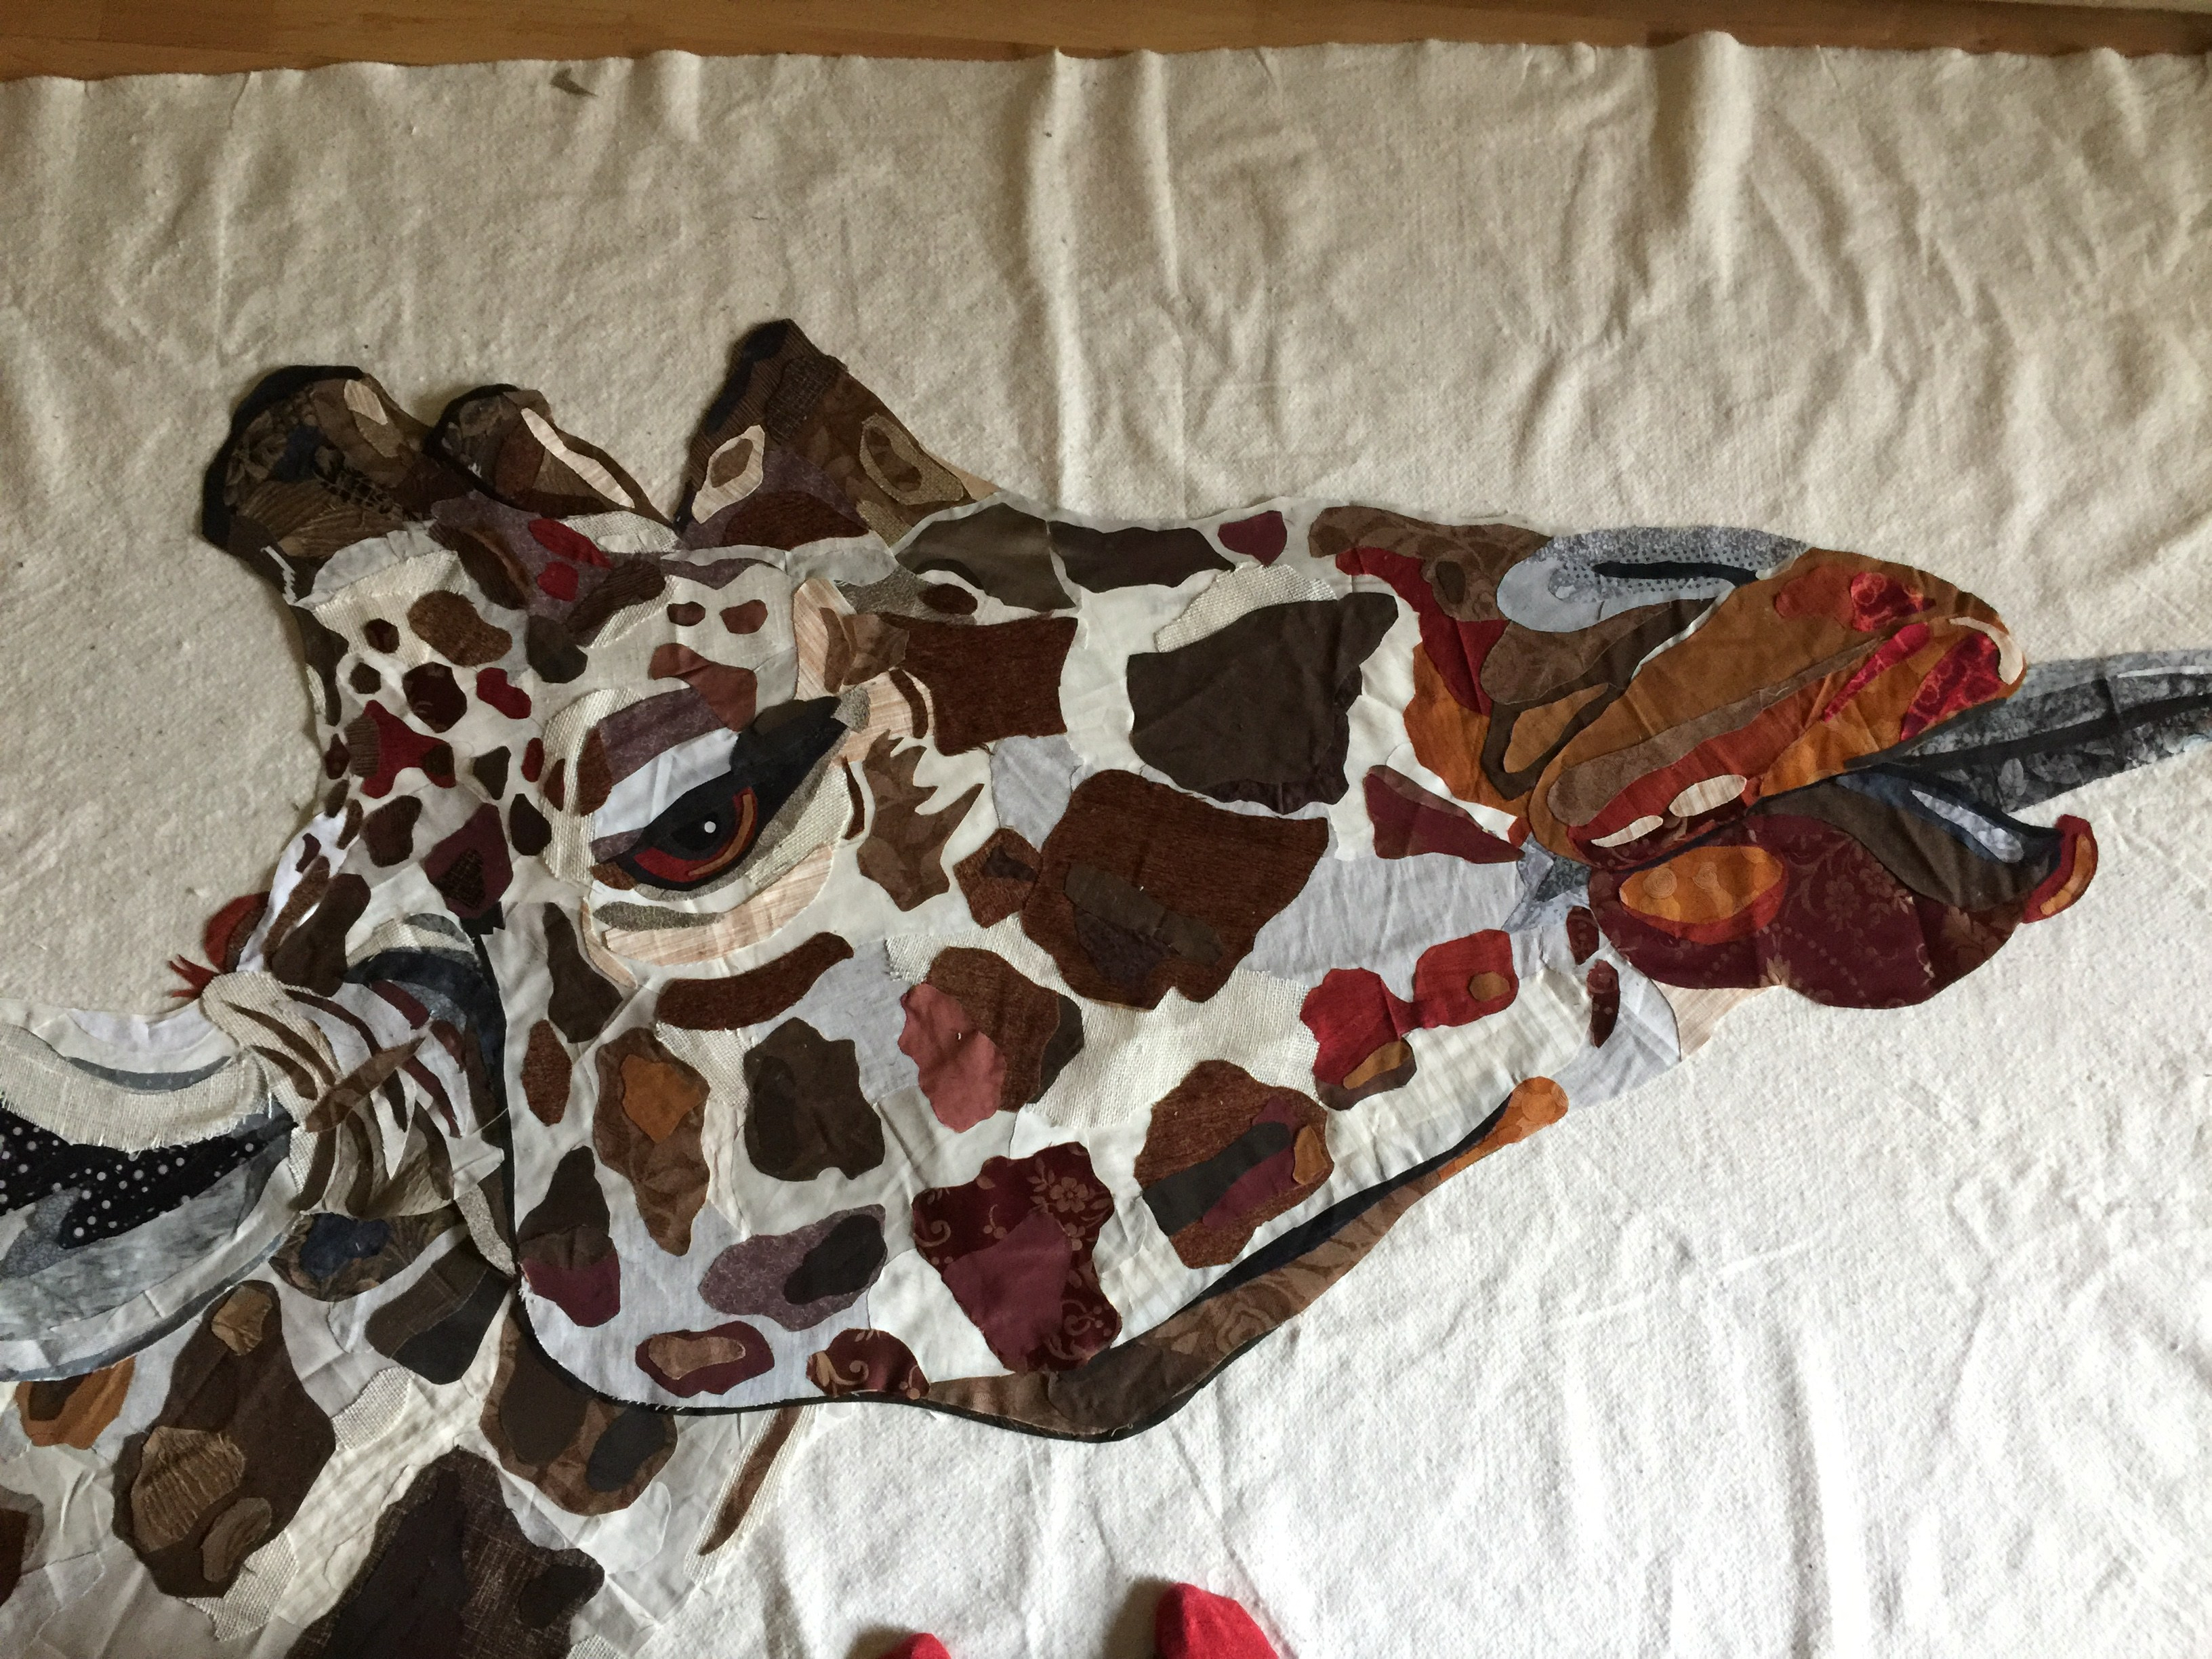 Completed giraffe head by Jane Haworth